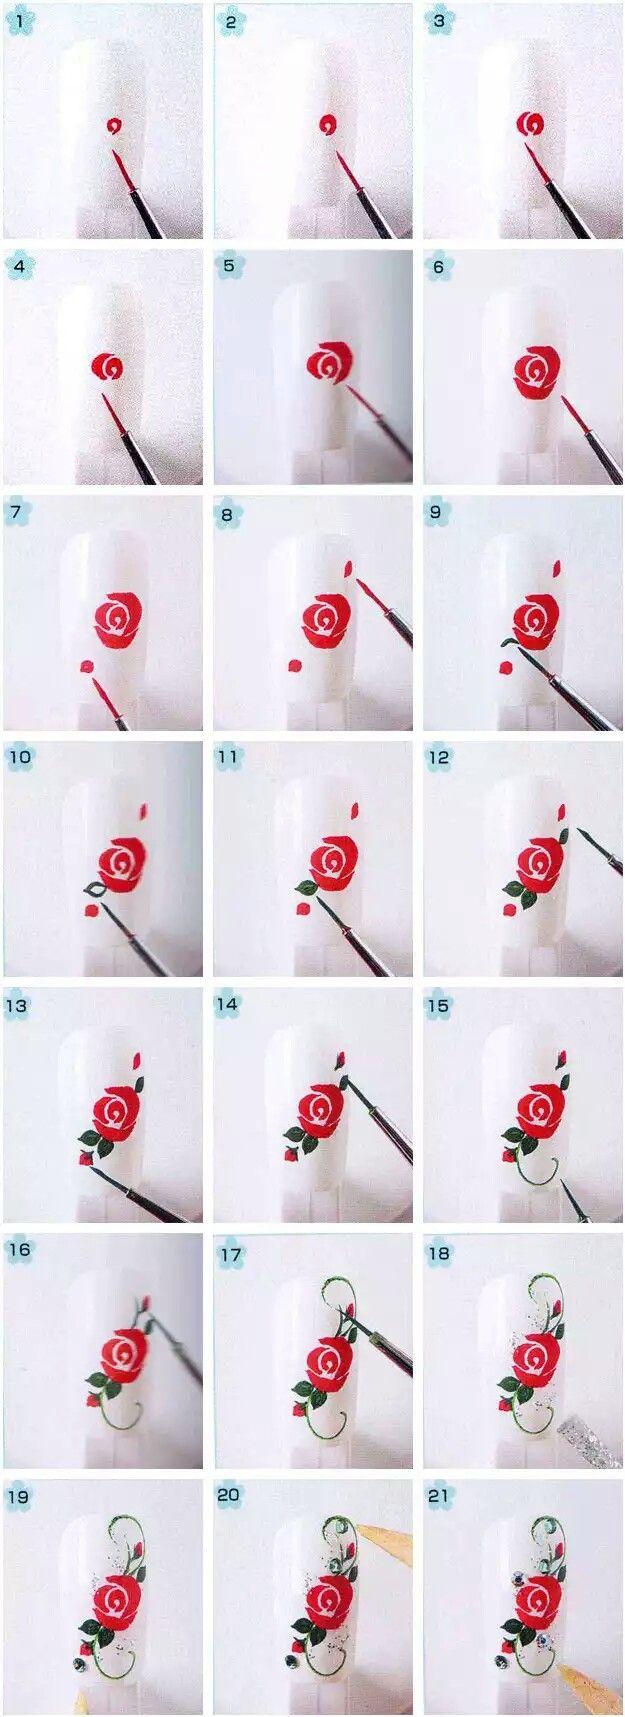 Rose art nail design step by step